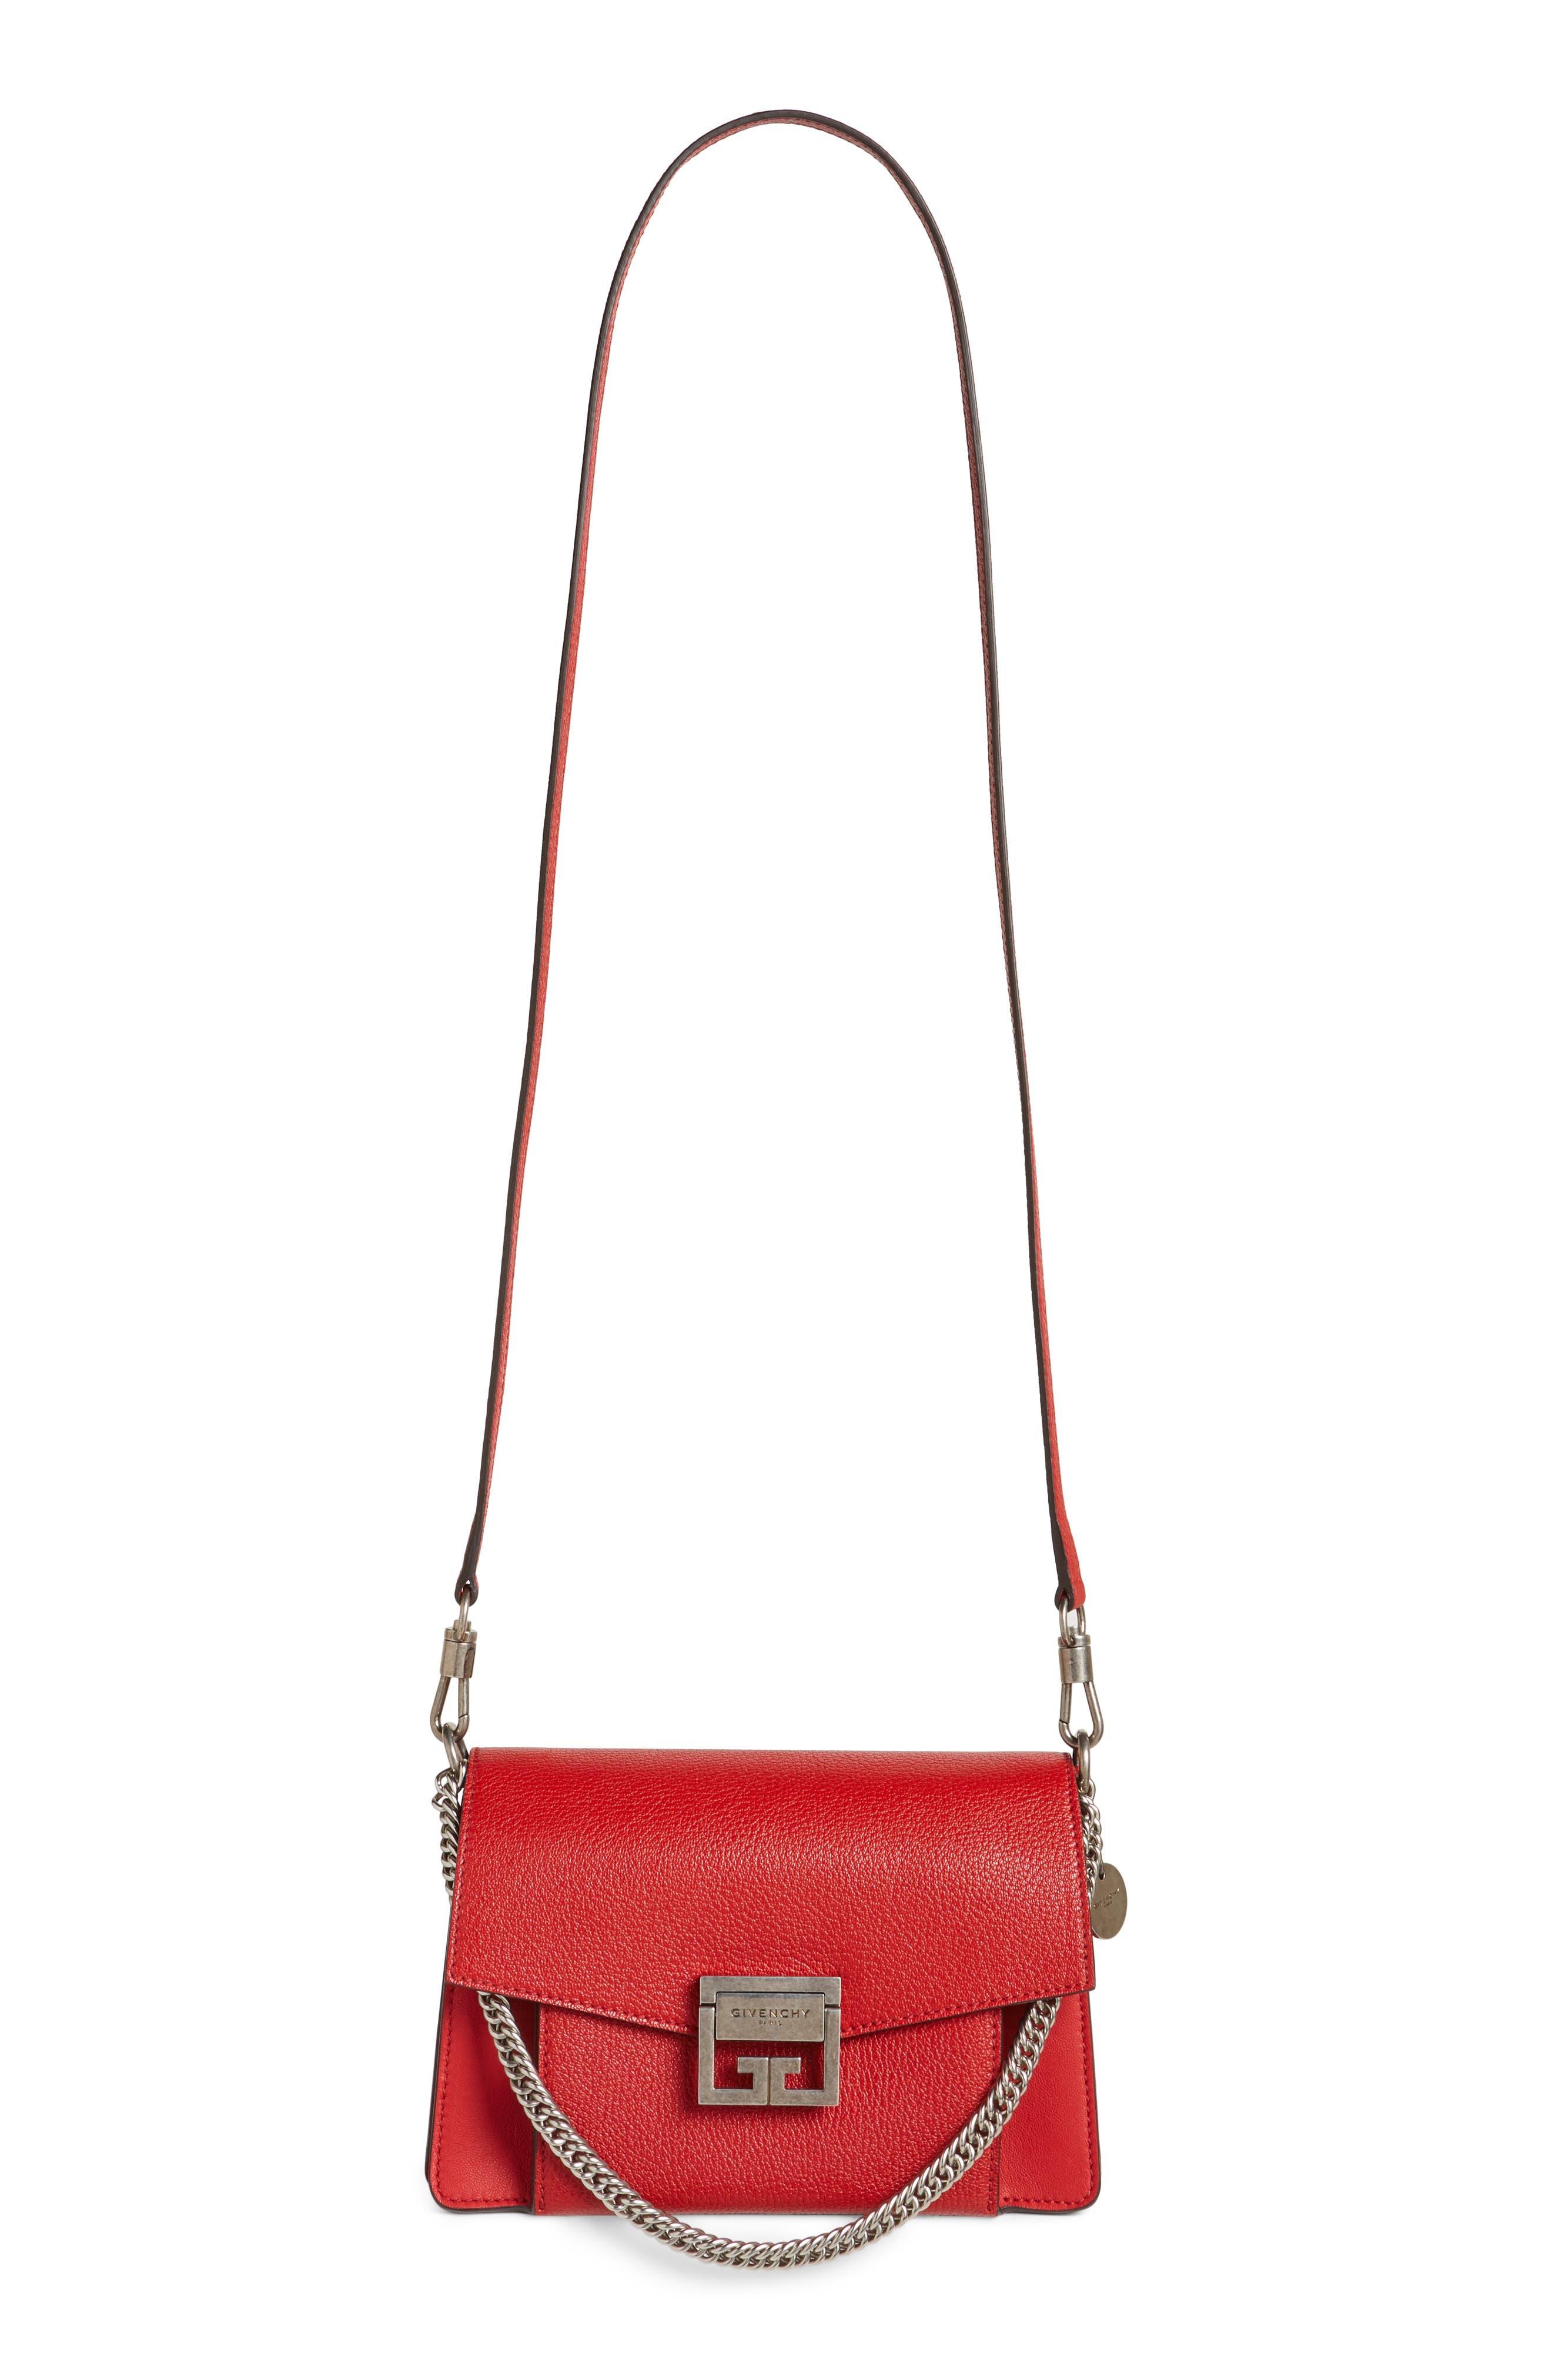 6e9e5b8bf9ce Givenchy Handbags | Nordstrom